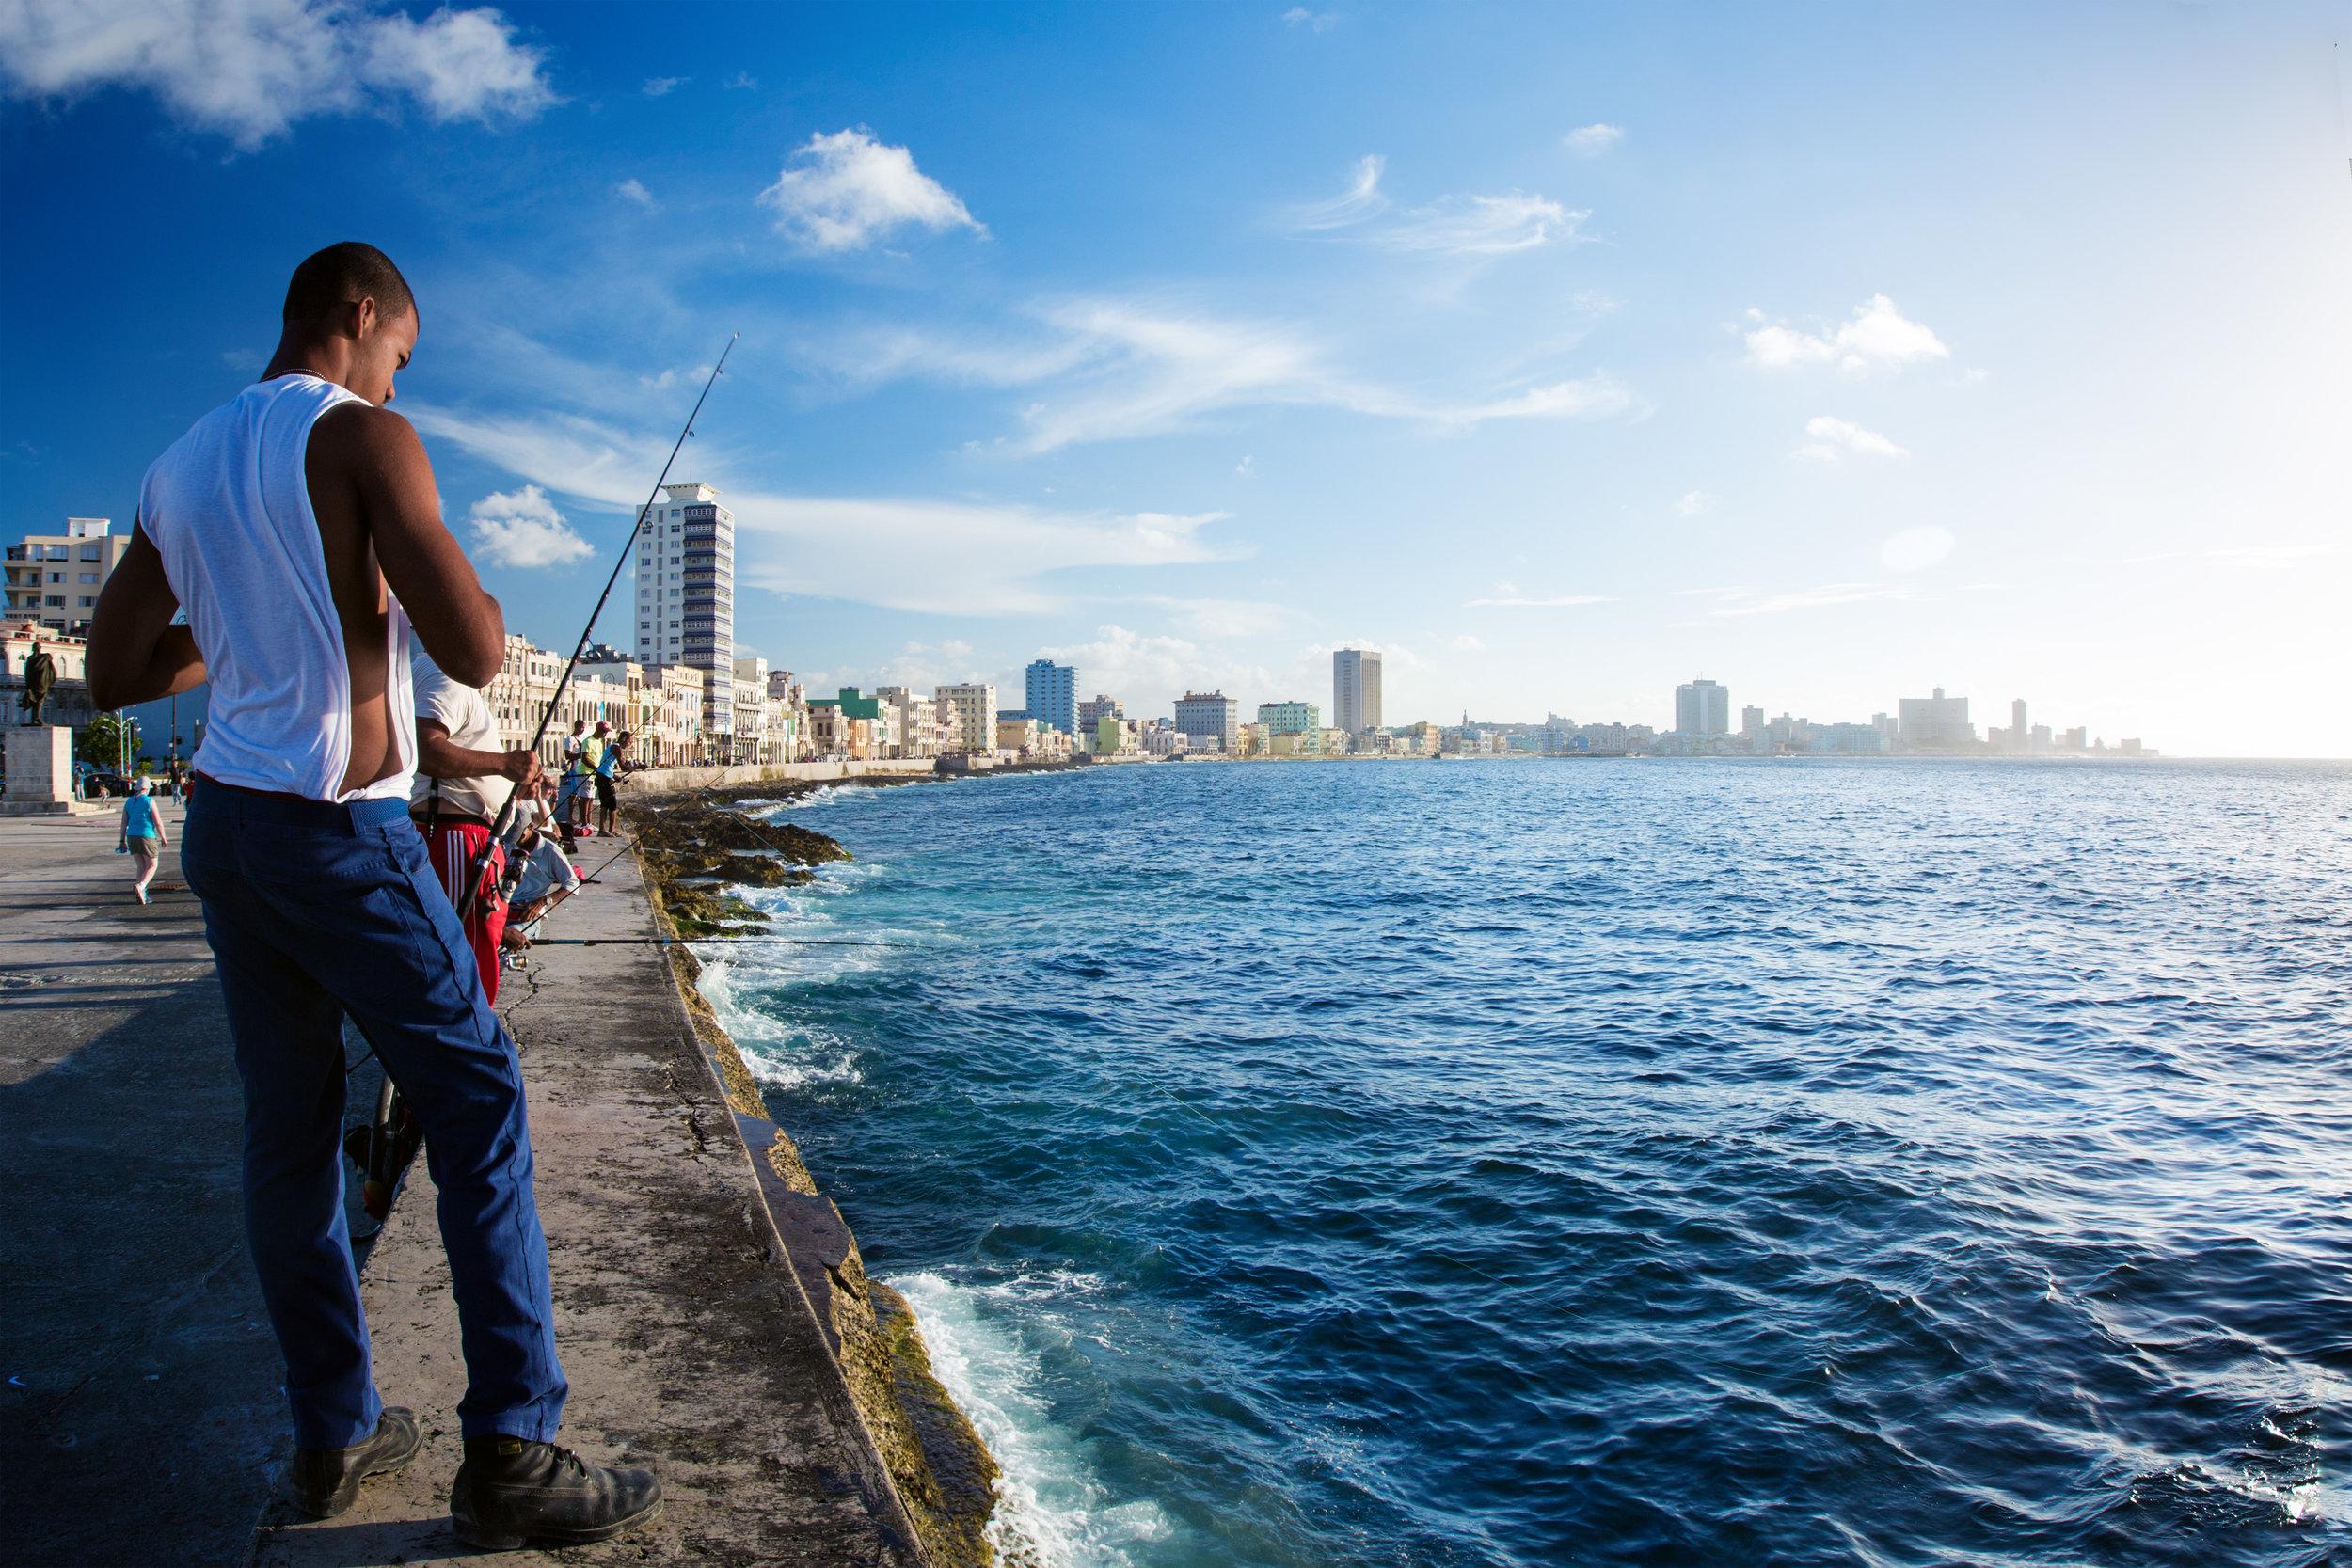 May2015Havana, Cuba